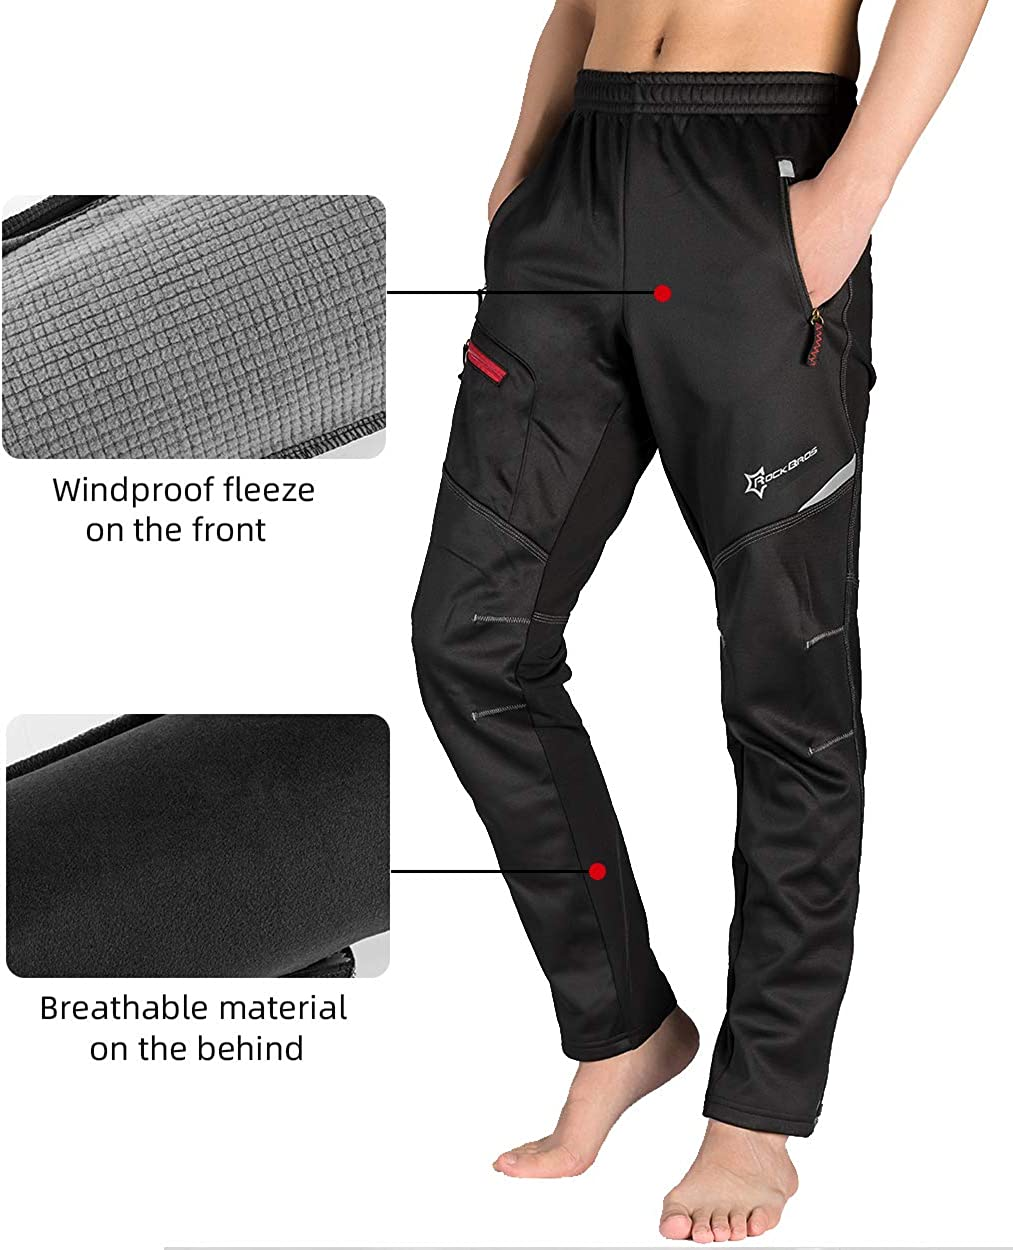 Details about  /ROCKBROS Bike Pnats Thermal Fleece Winter Cycling Sportswear Reflective Trousers